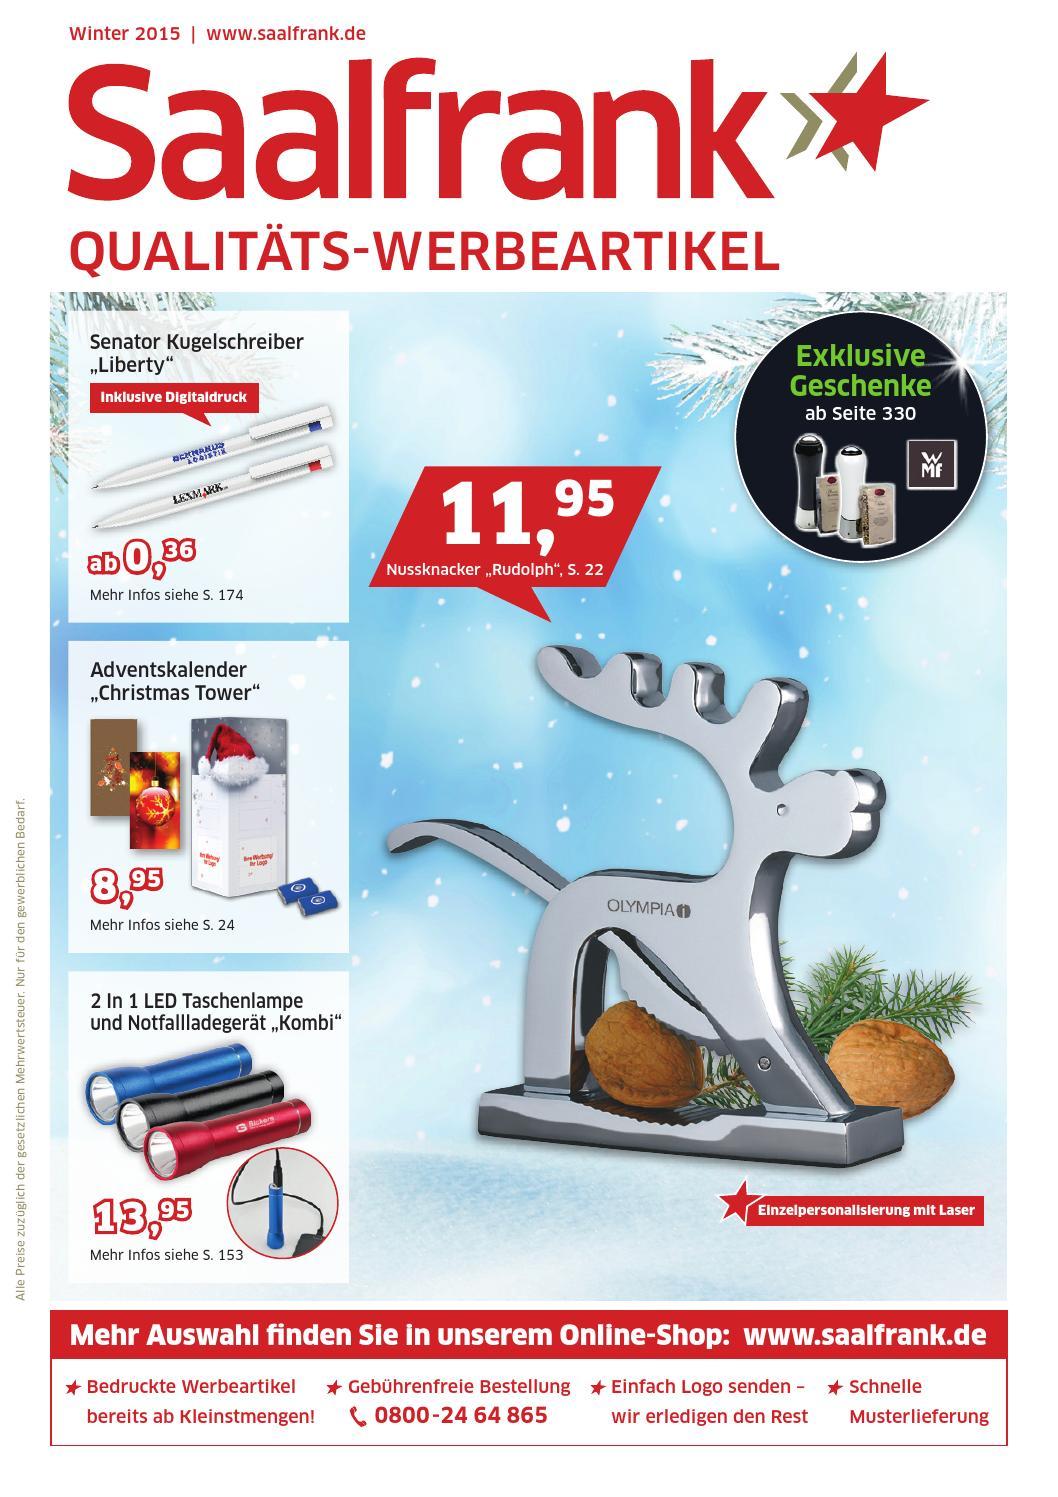 Saalfrank Qualitäts-Werbeartikel Katalog Winter 2015 by Bettmer ...